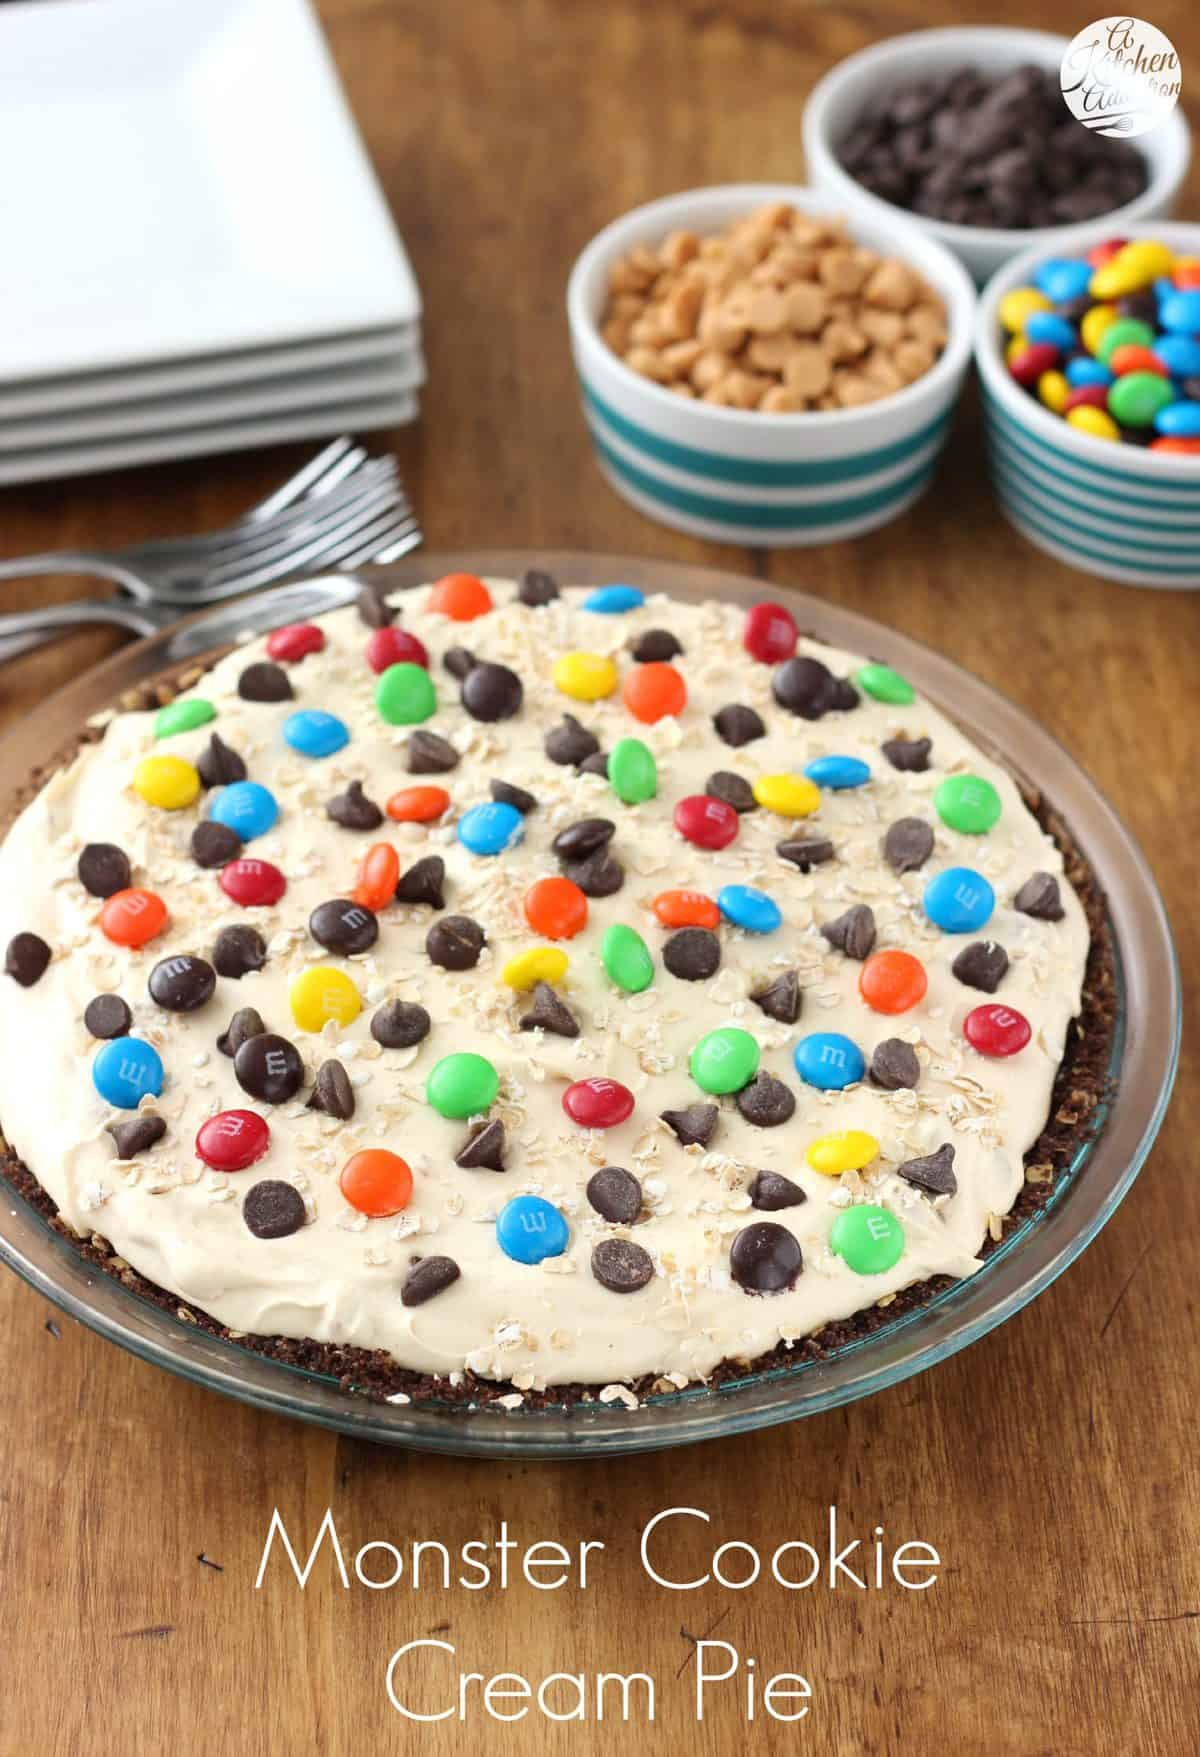 Monster Cookie Cream Pie